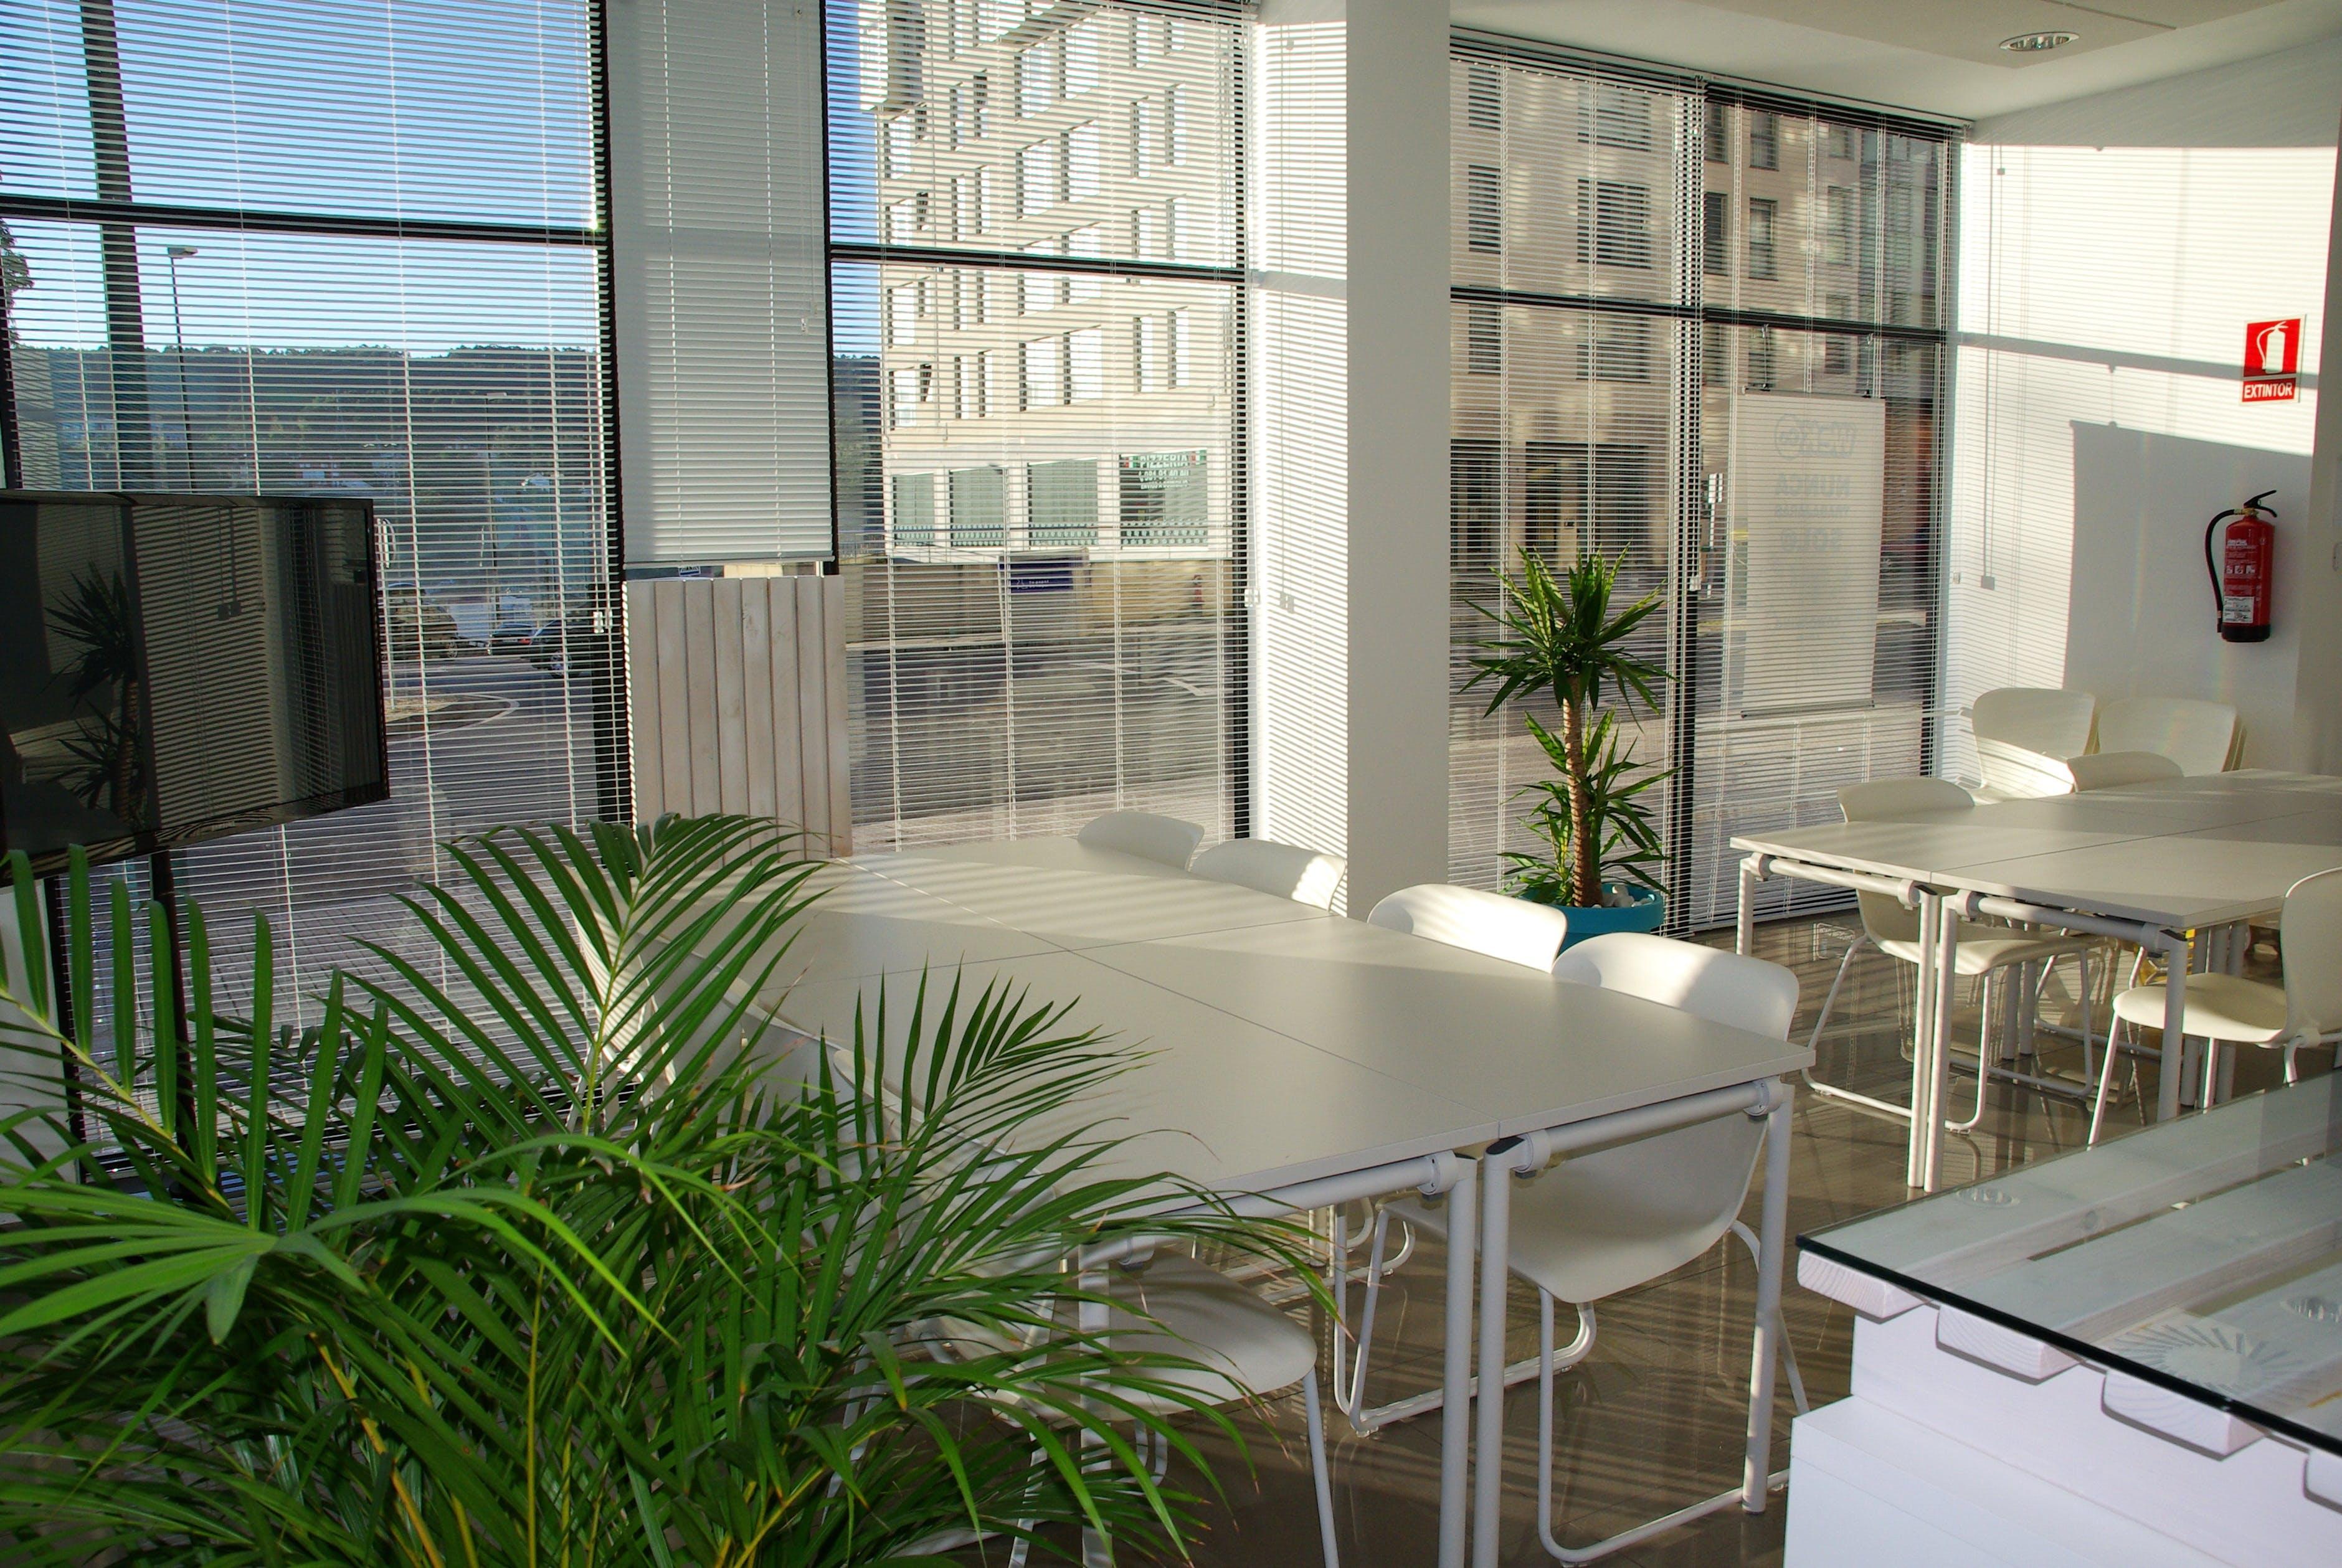 apartment, architecture, business